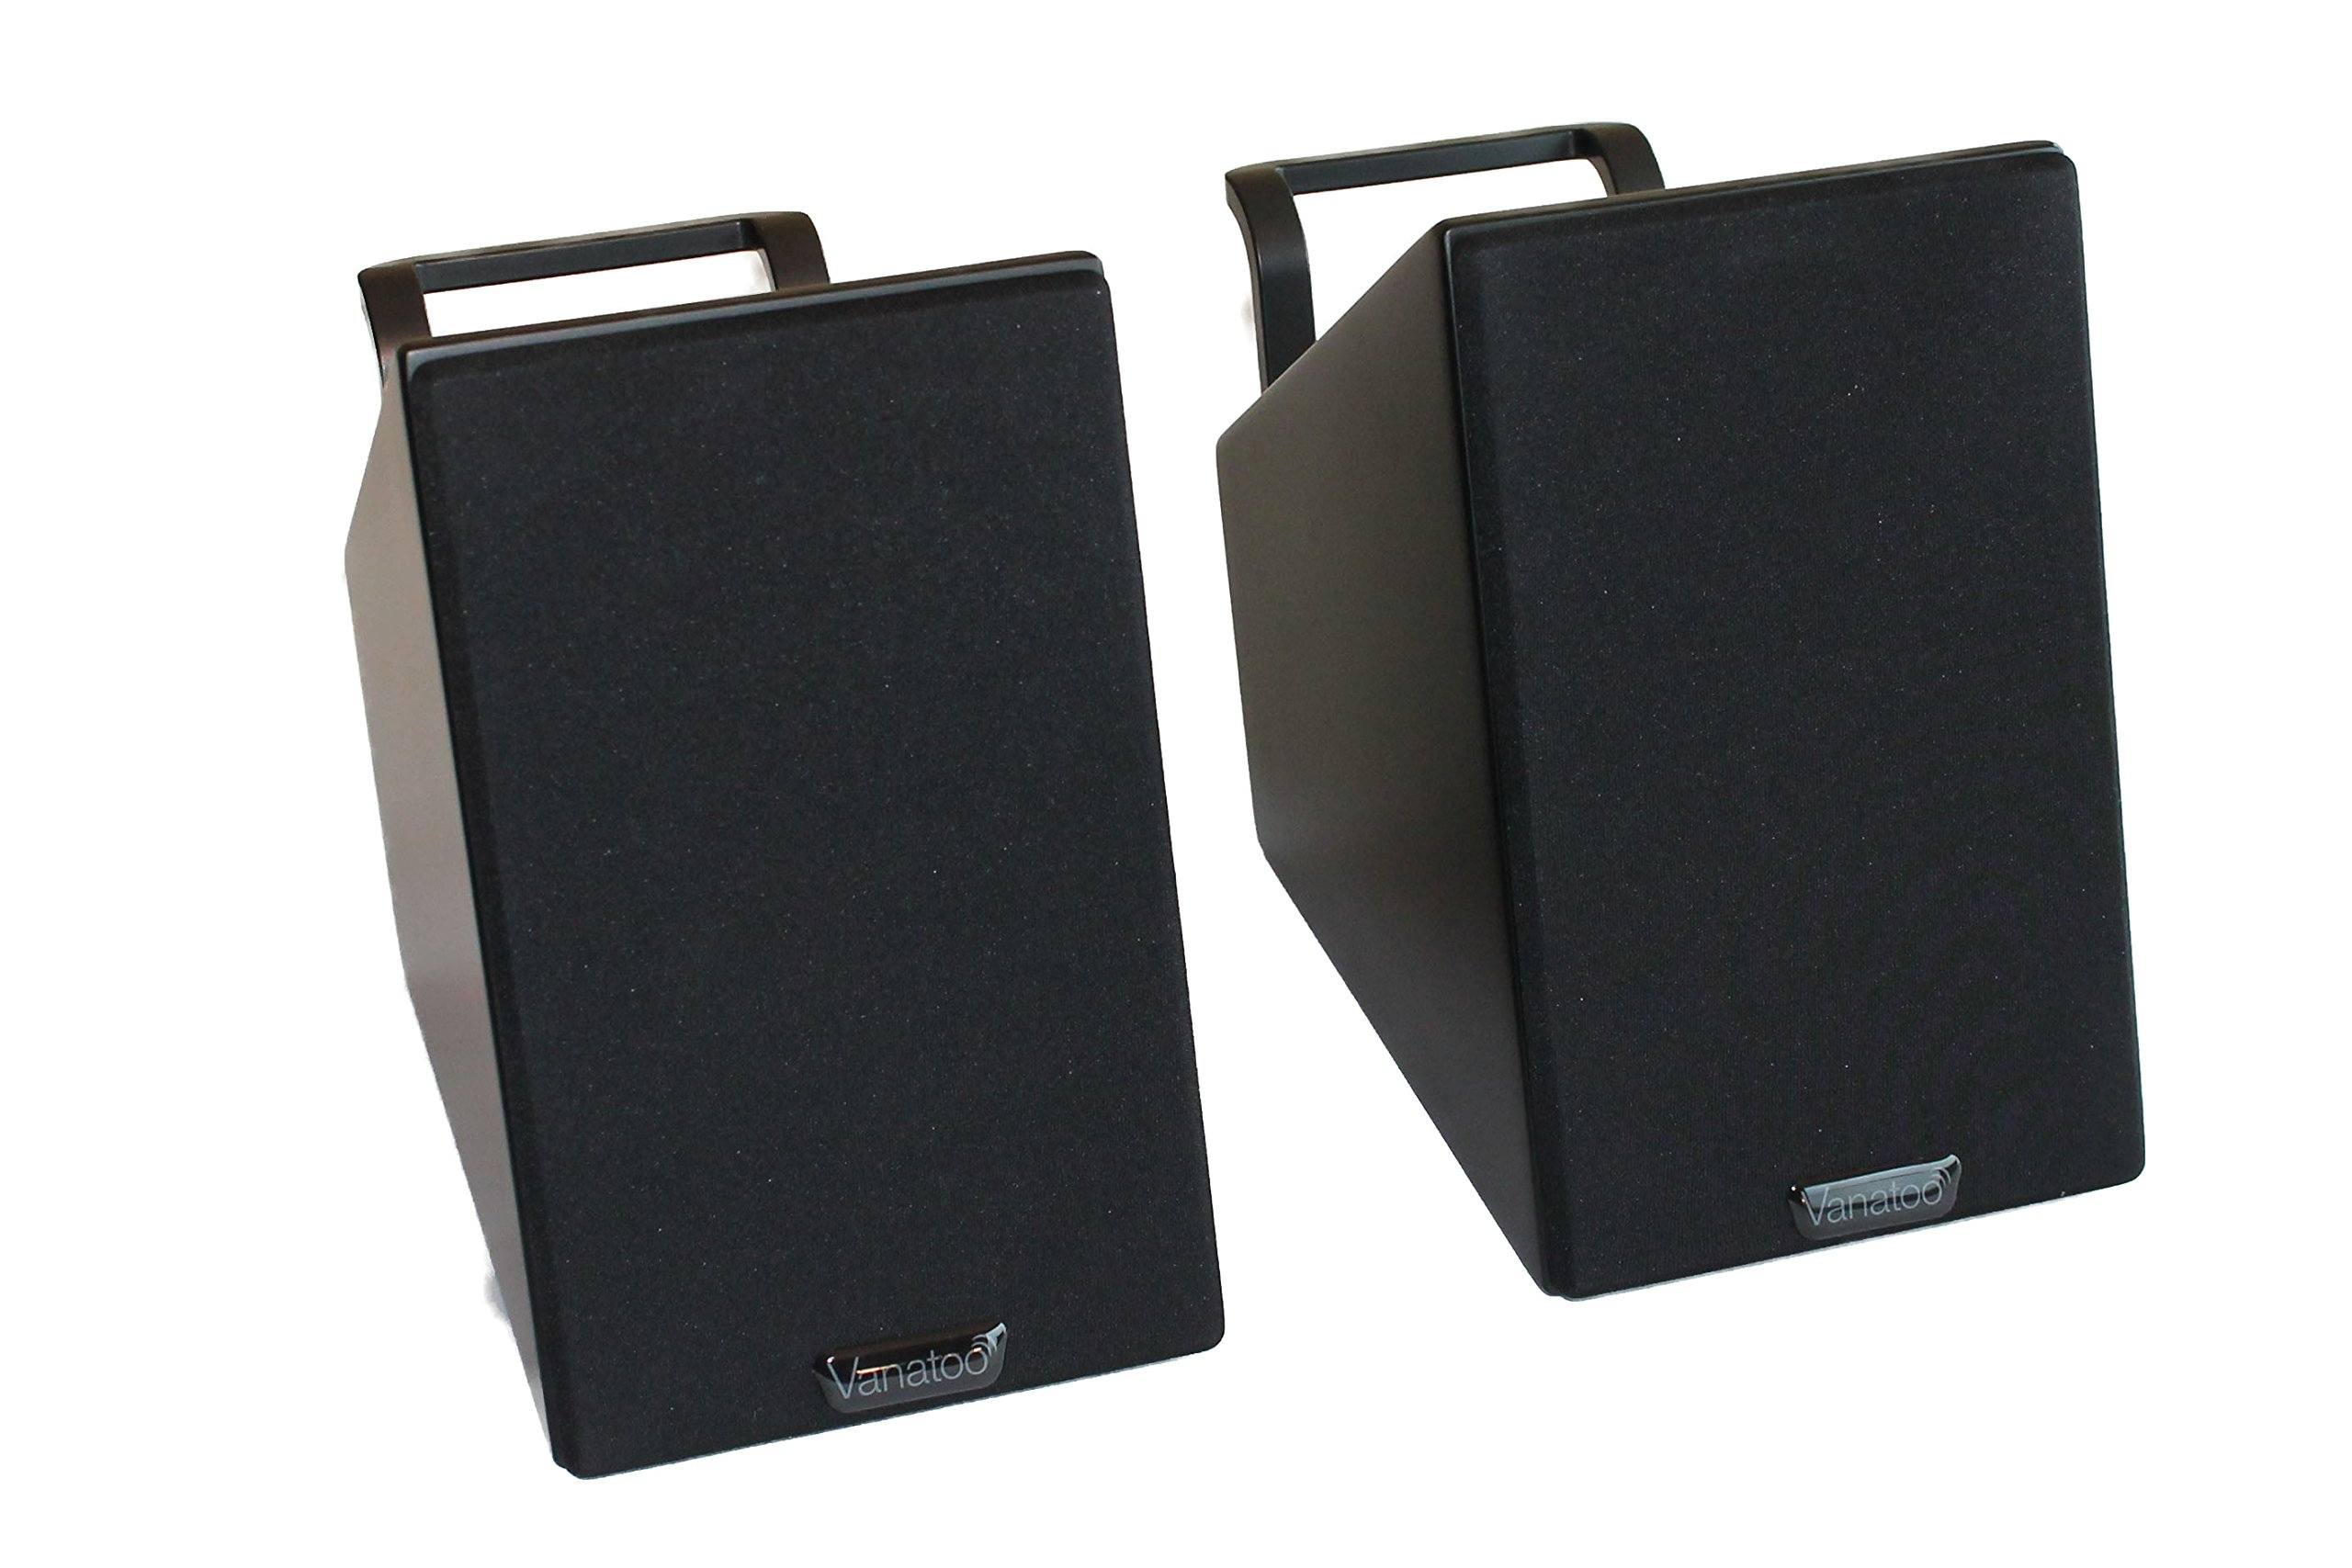 Vanatoo Transparent Zero Powered Speakers (Black, Set of 2) by Vanatoo